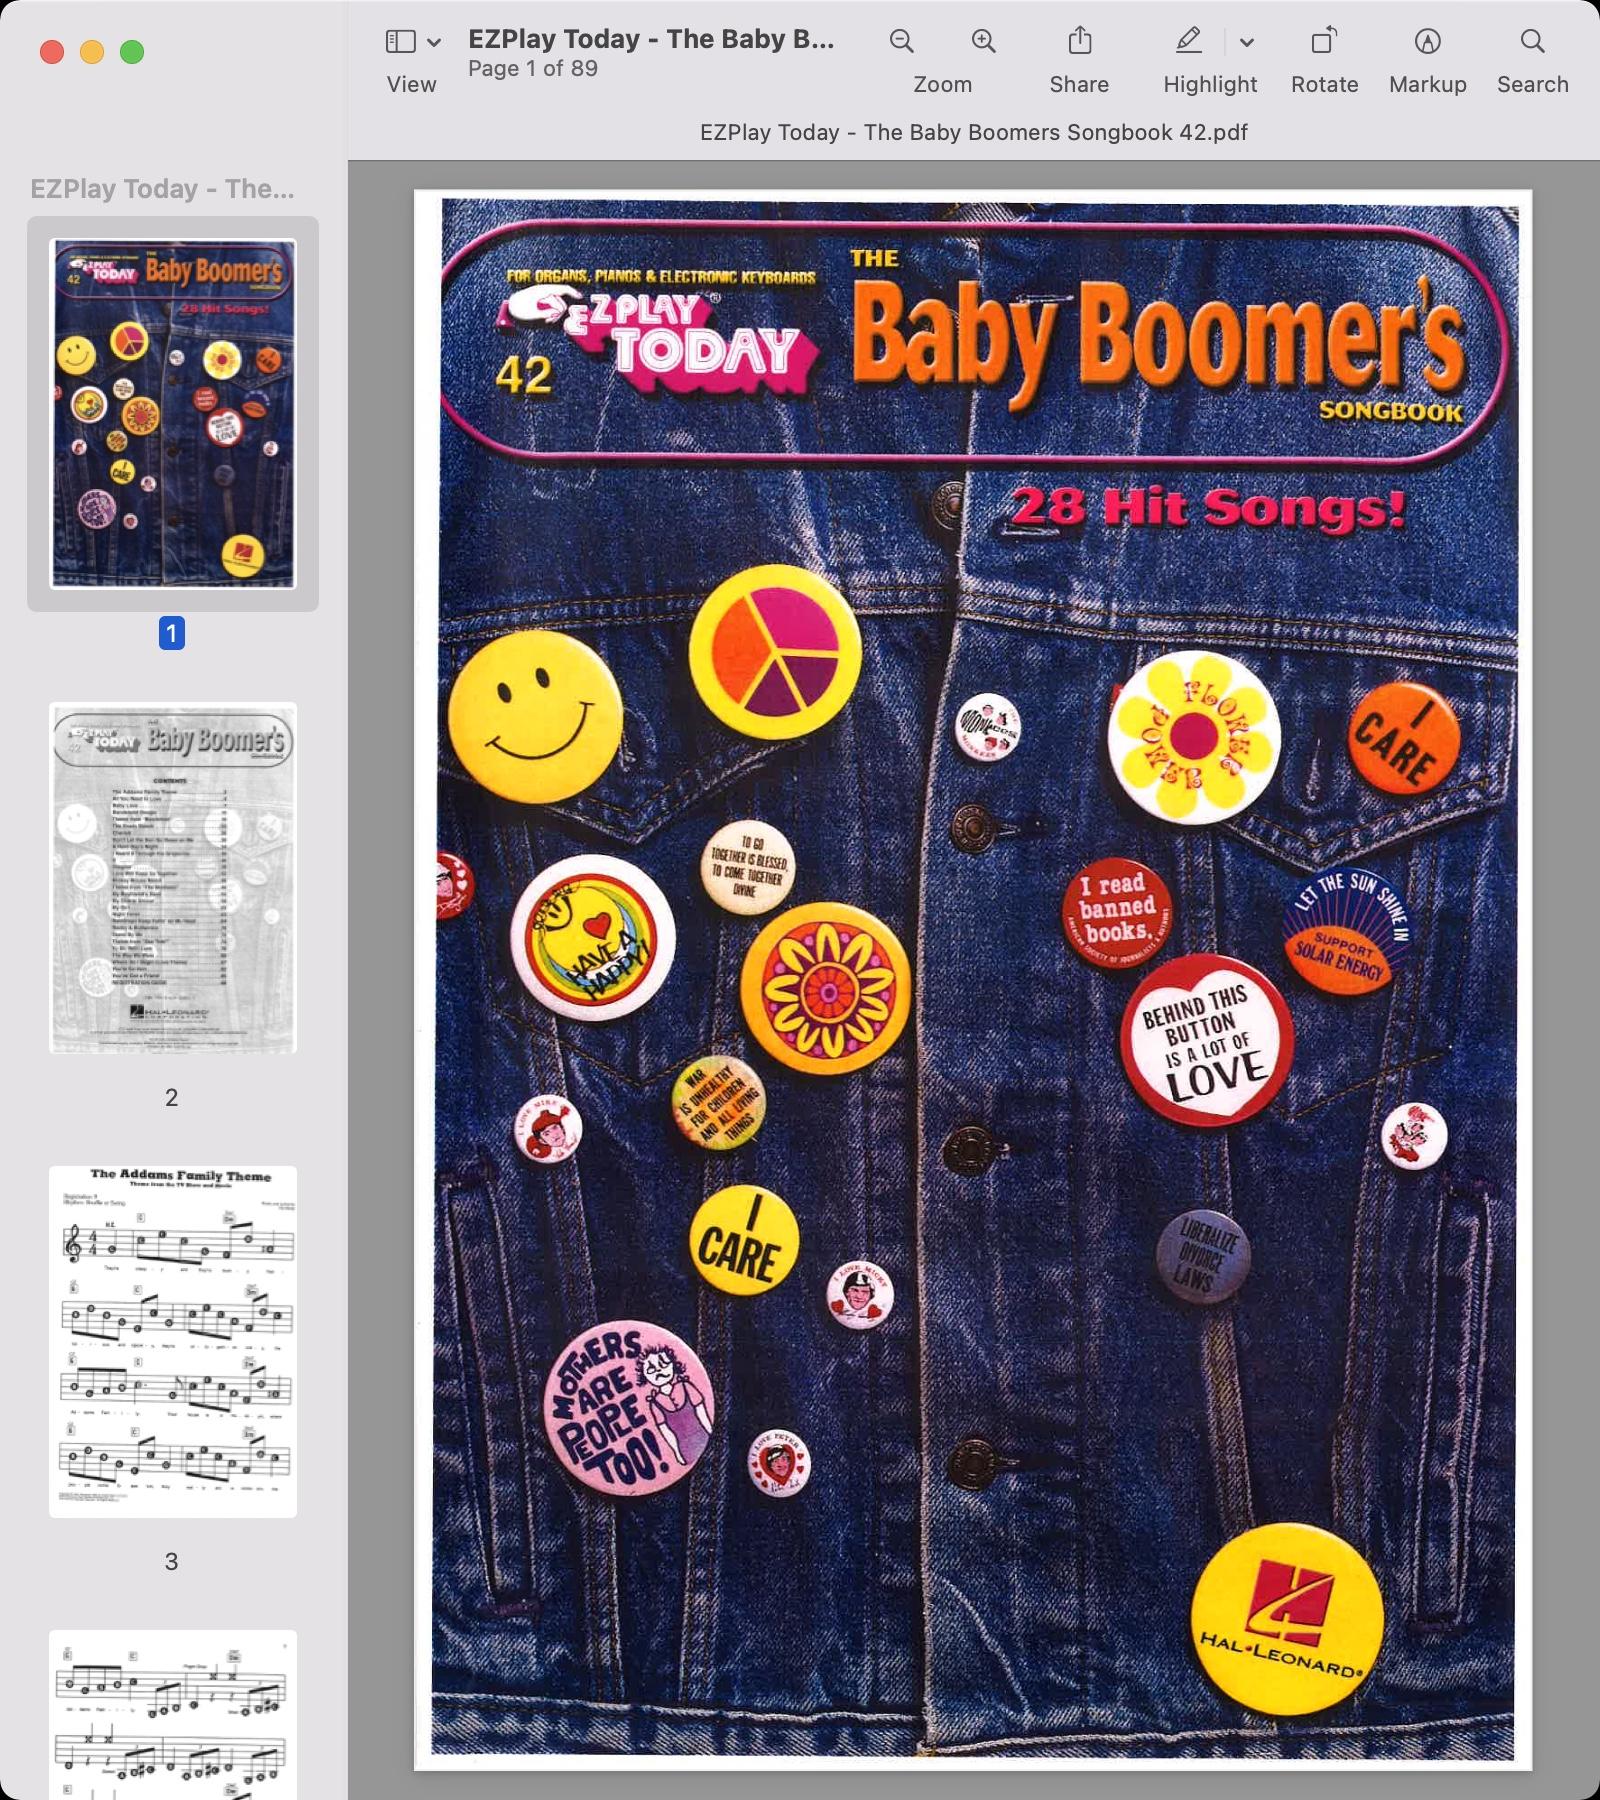 EZPlay Today 42 - The Baby Boomers Songbook.jpg